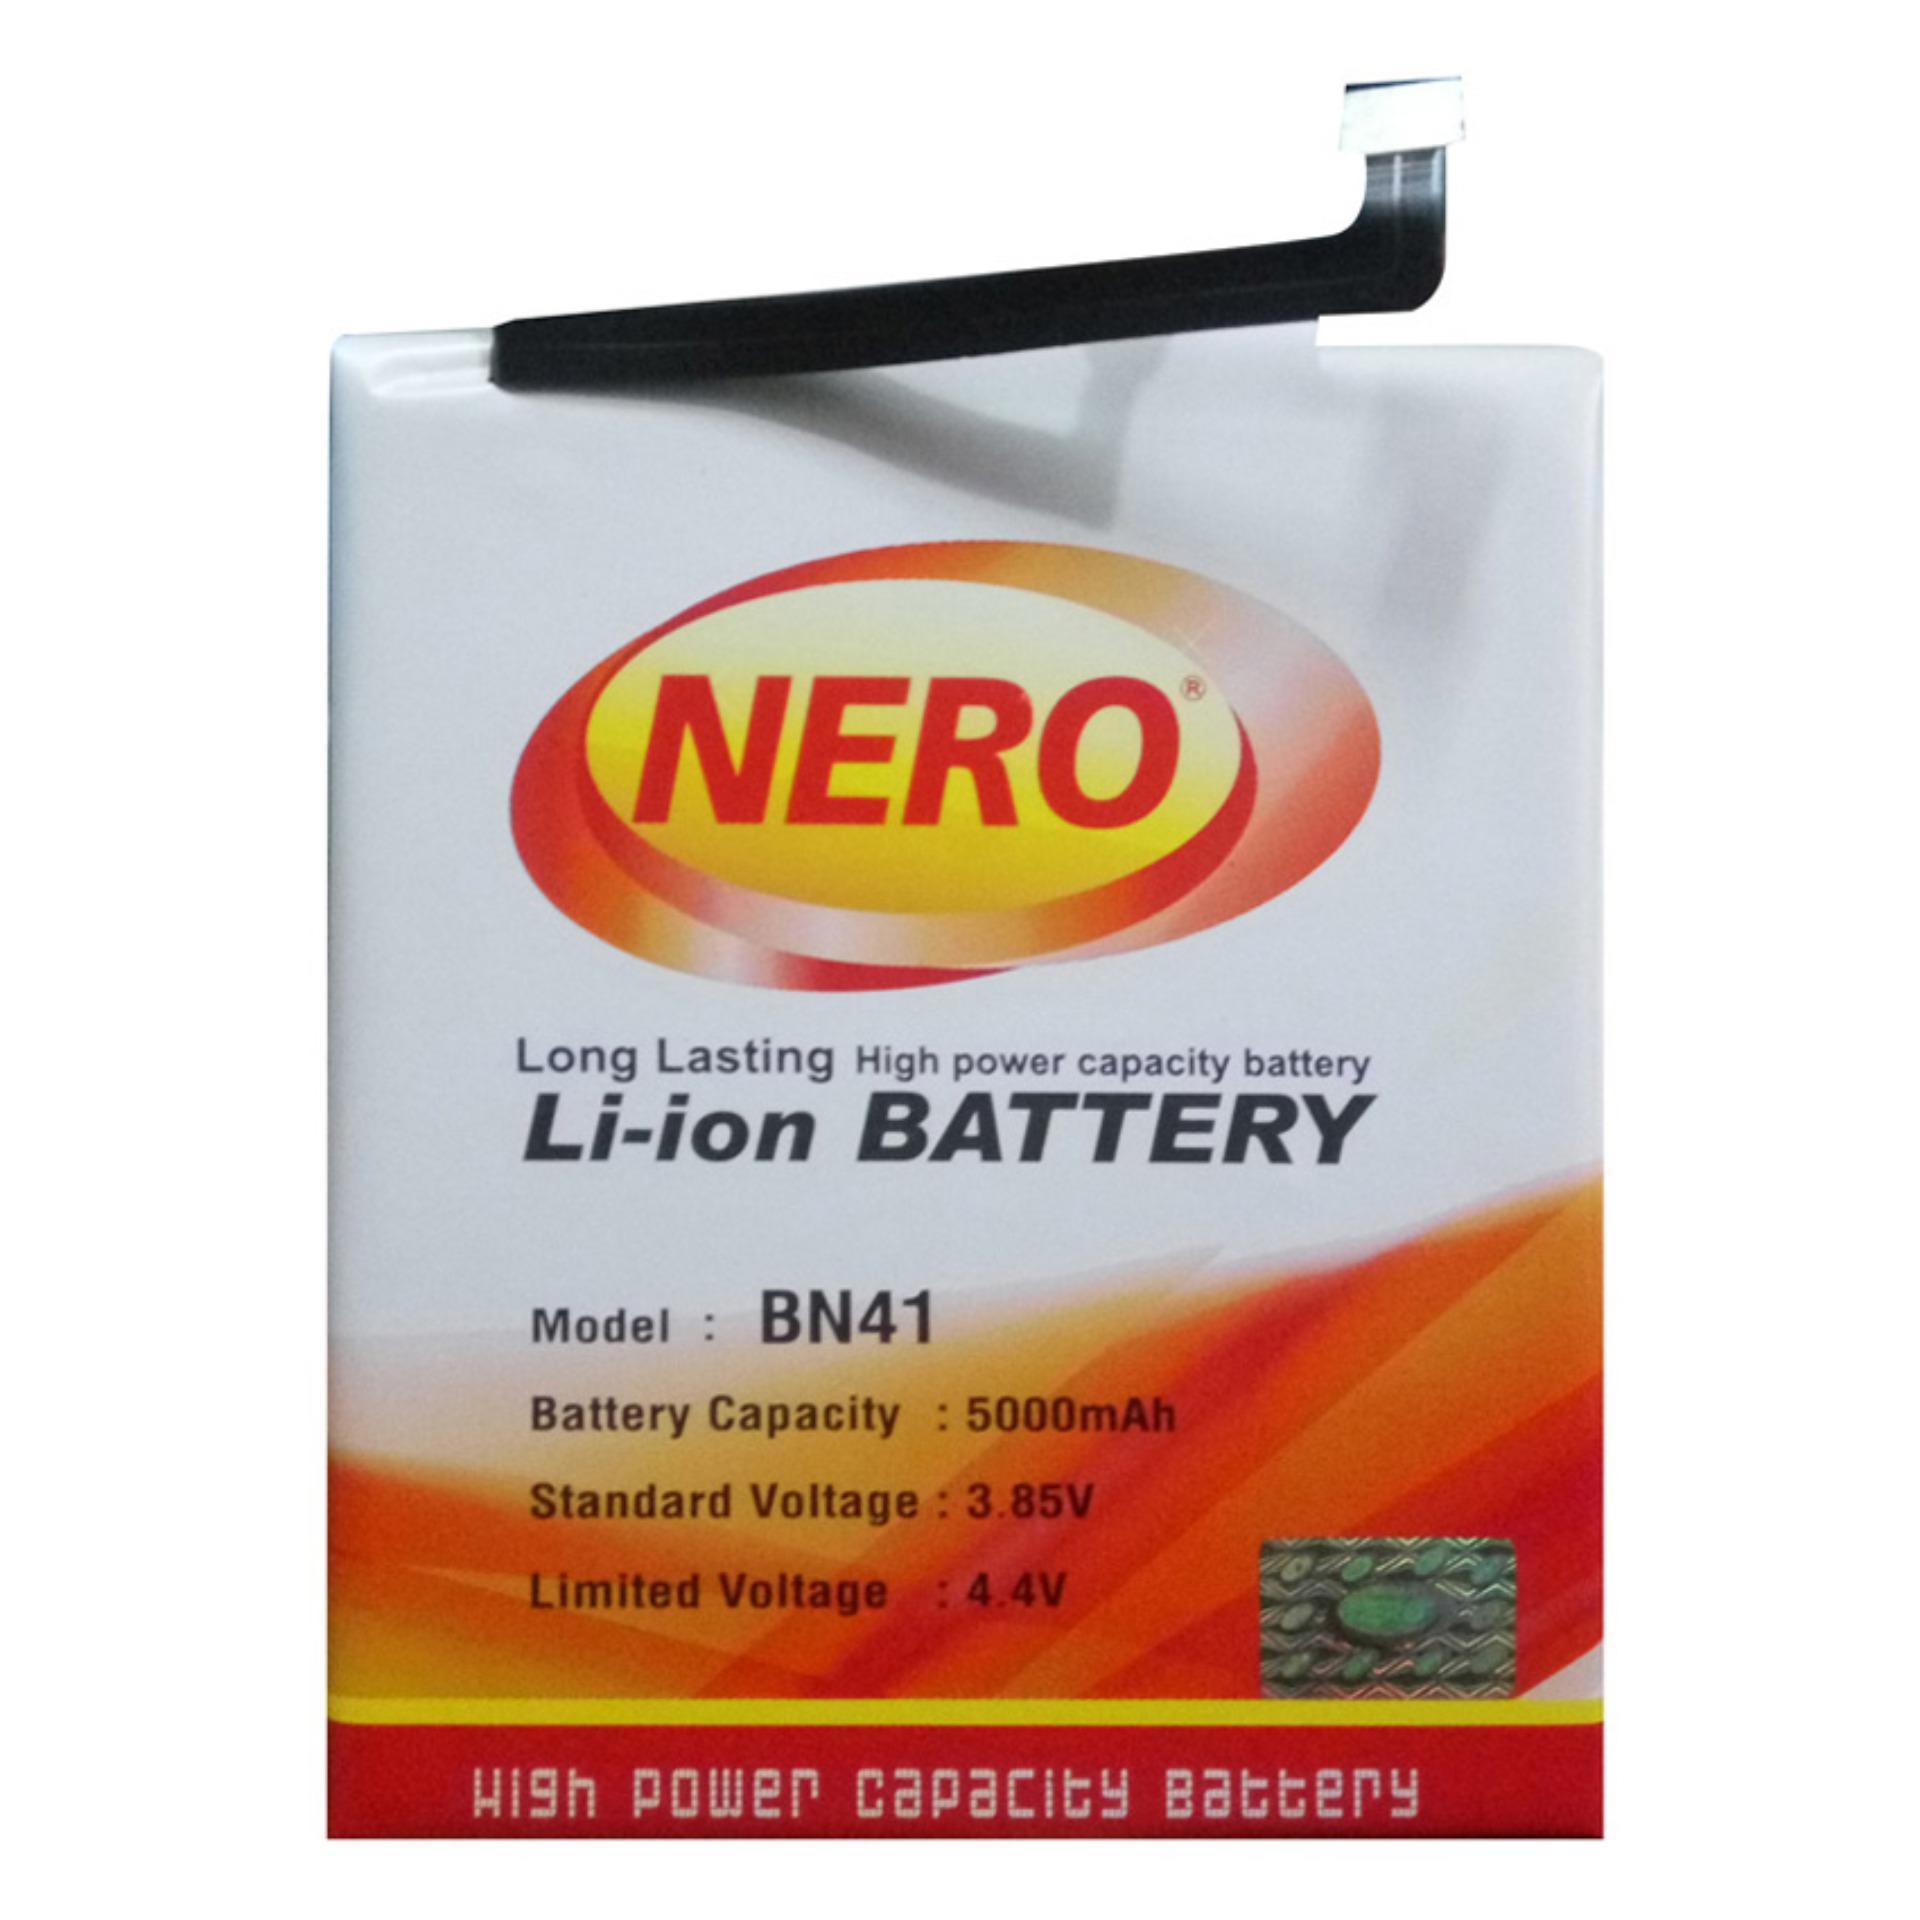 Nero Baterai Double Power untuk Xiaomi Redmi Note 4 / BN41L - 5000 mAh